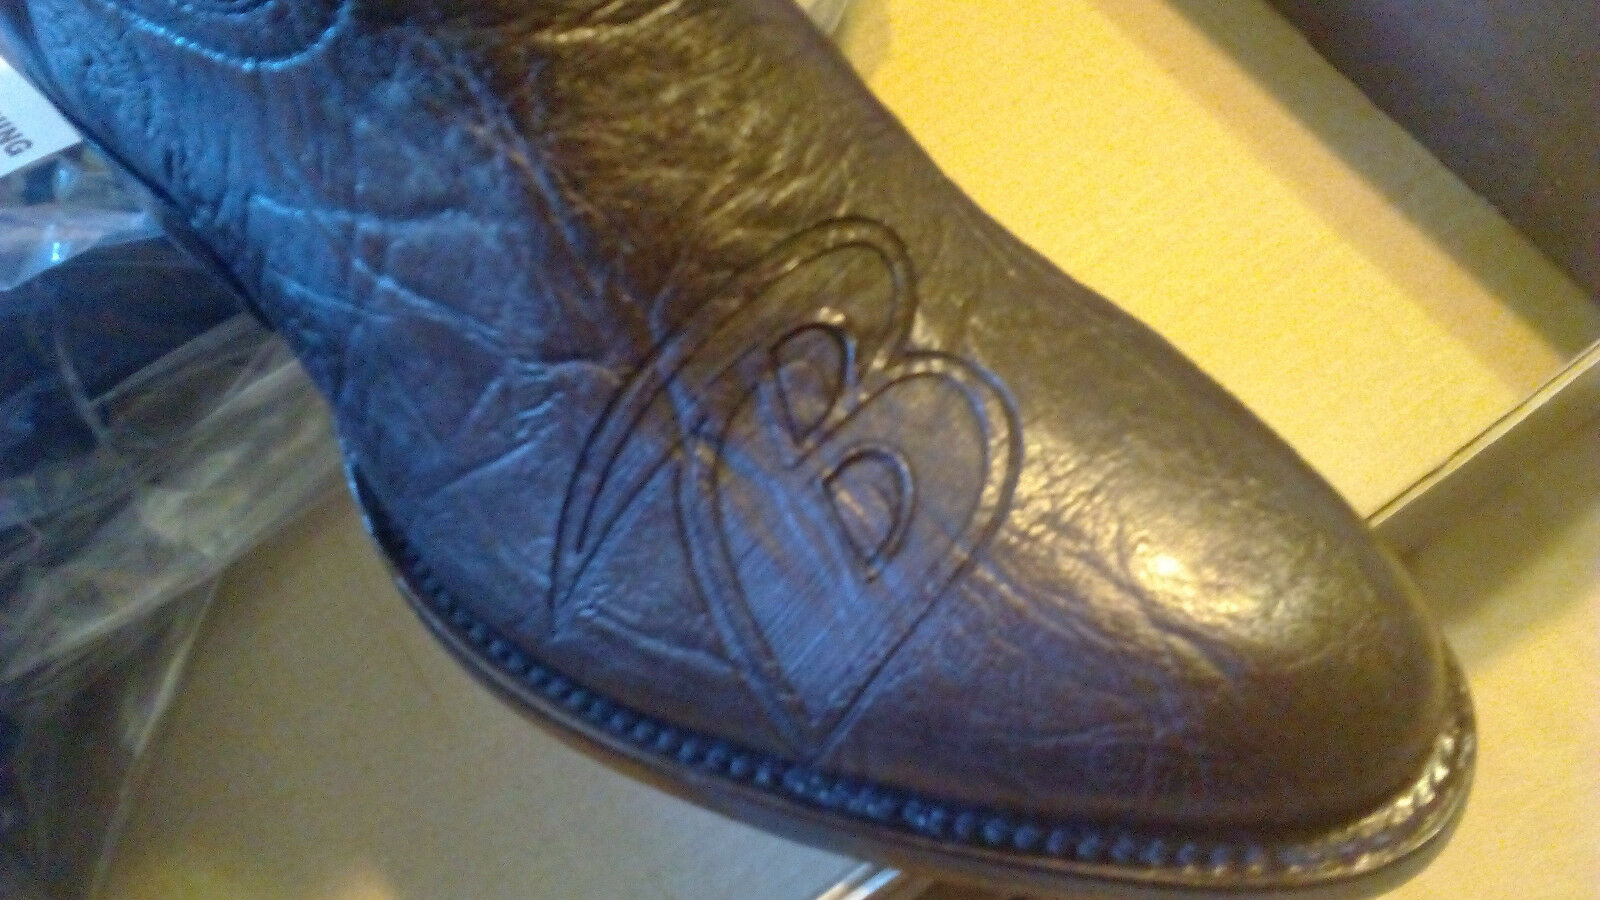 NFL BALTIMORE RAVENS Men's Cowboy Western Leather stivali Mens Dimensione 10 FREE SHIP